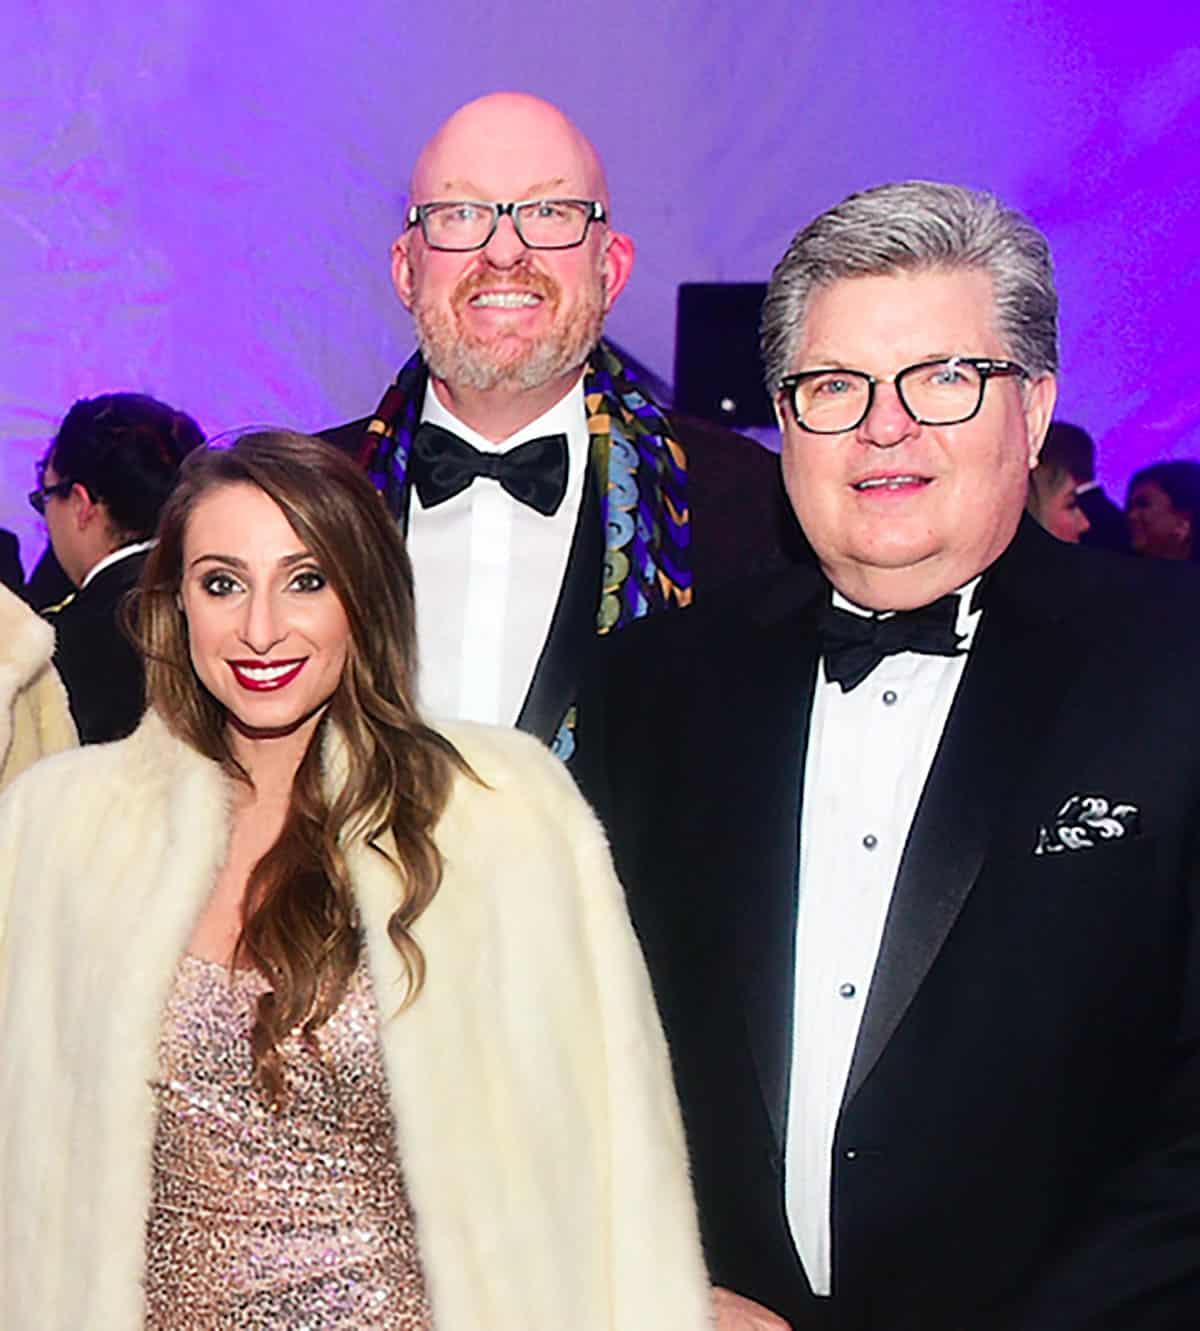 Mandy Miceli, Allen Crowder and Cliff Buech